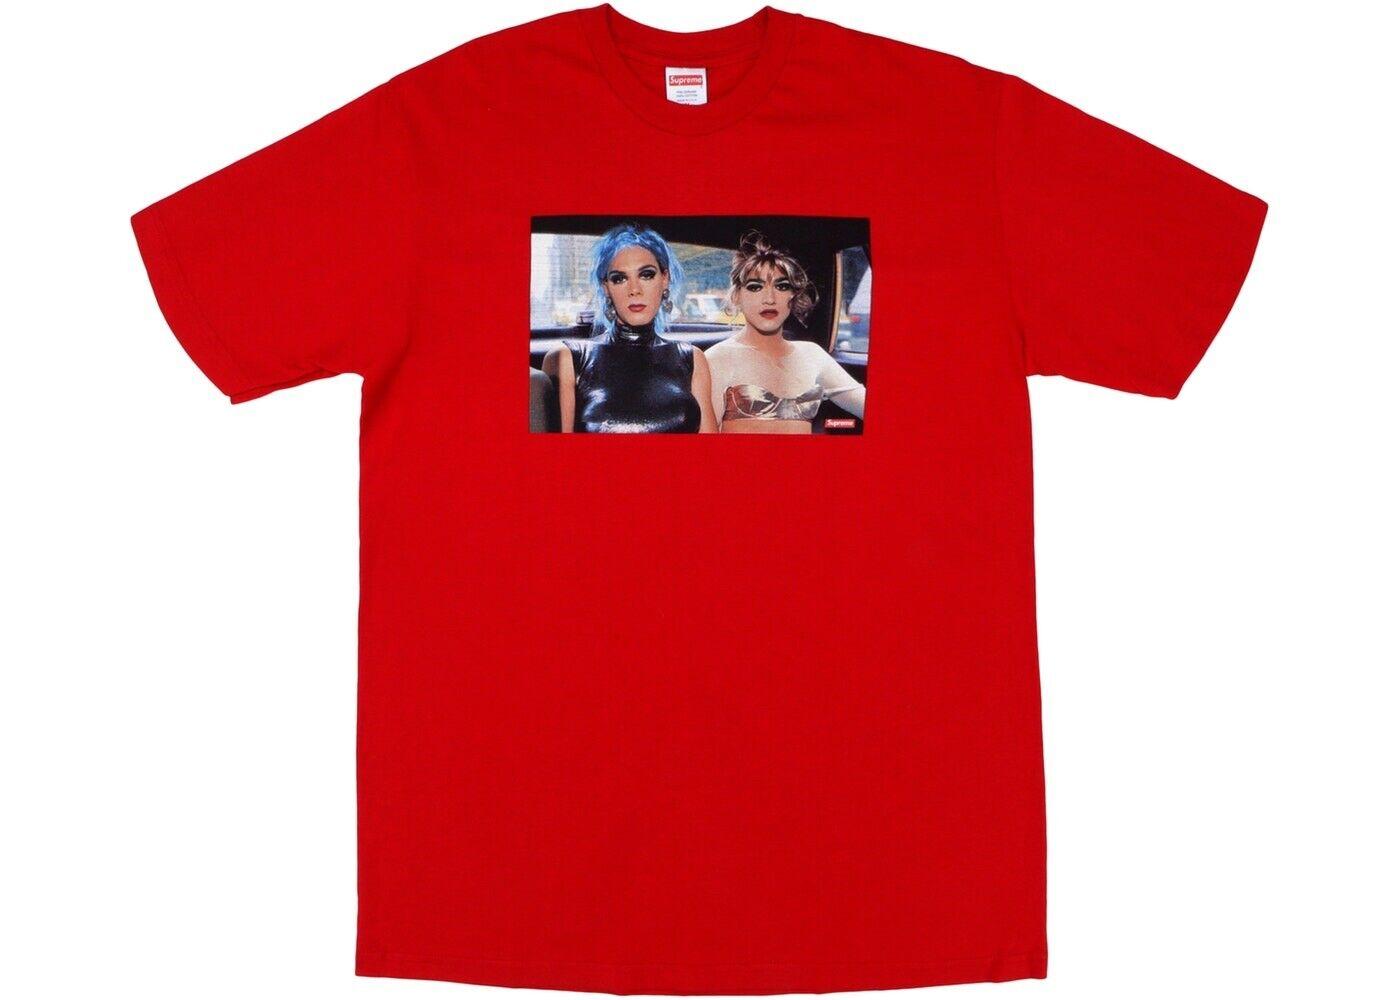 Supreme x Nan goldin Misty & Jimmy Paulette Tee Shirt Size Large L Red SS18